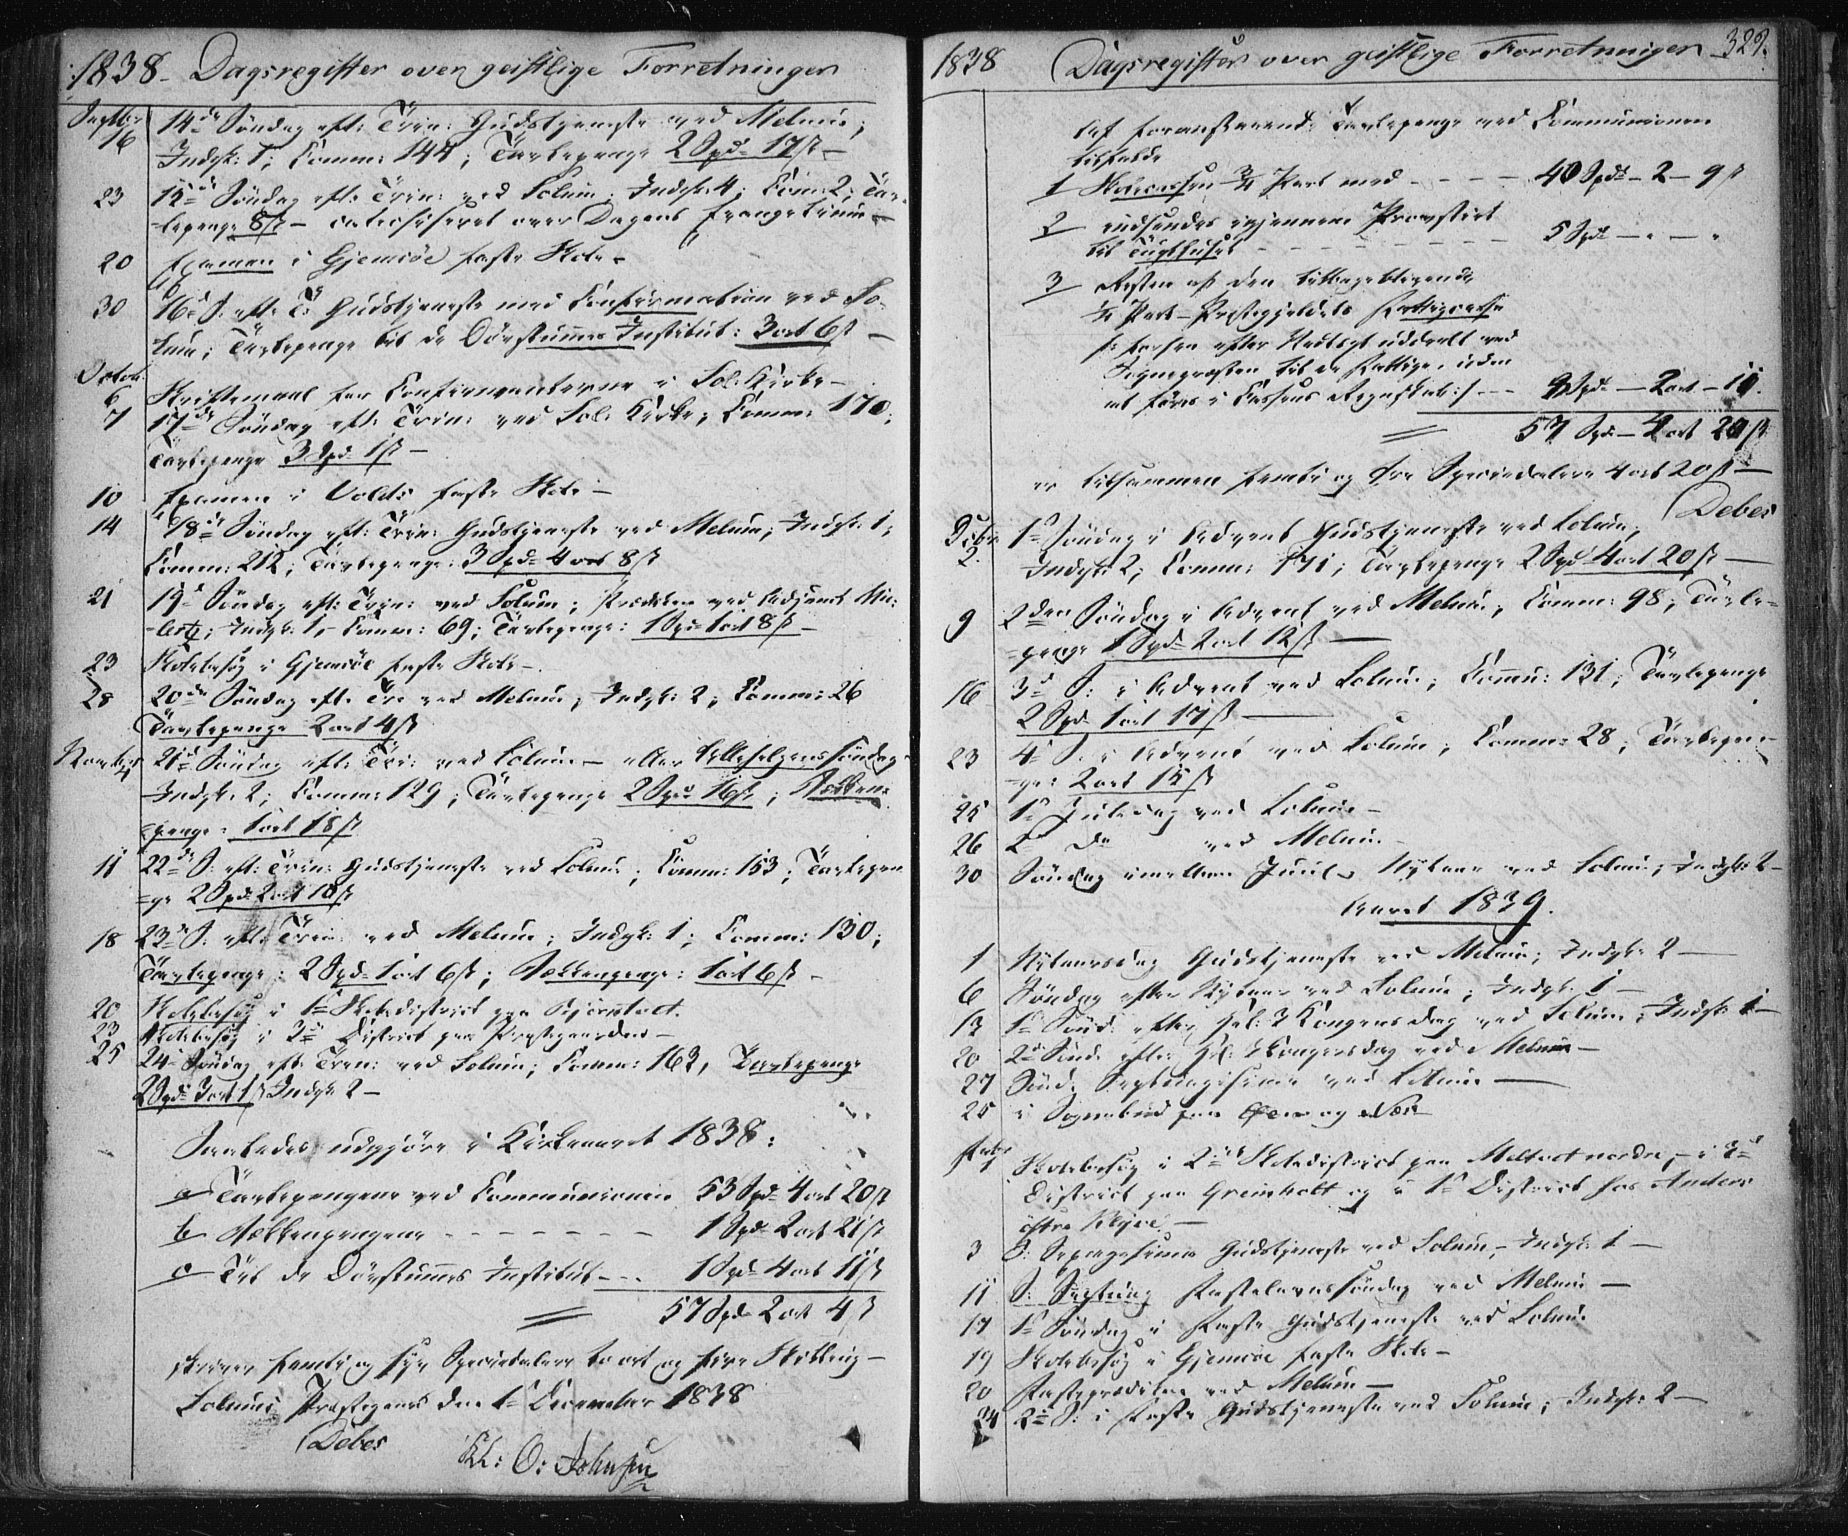 SAKO, Solum kirkebøker, F/Fa/L0005: Ministerialbok nr. I 5, 1833-1843, s. 329